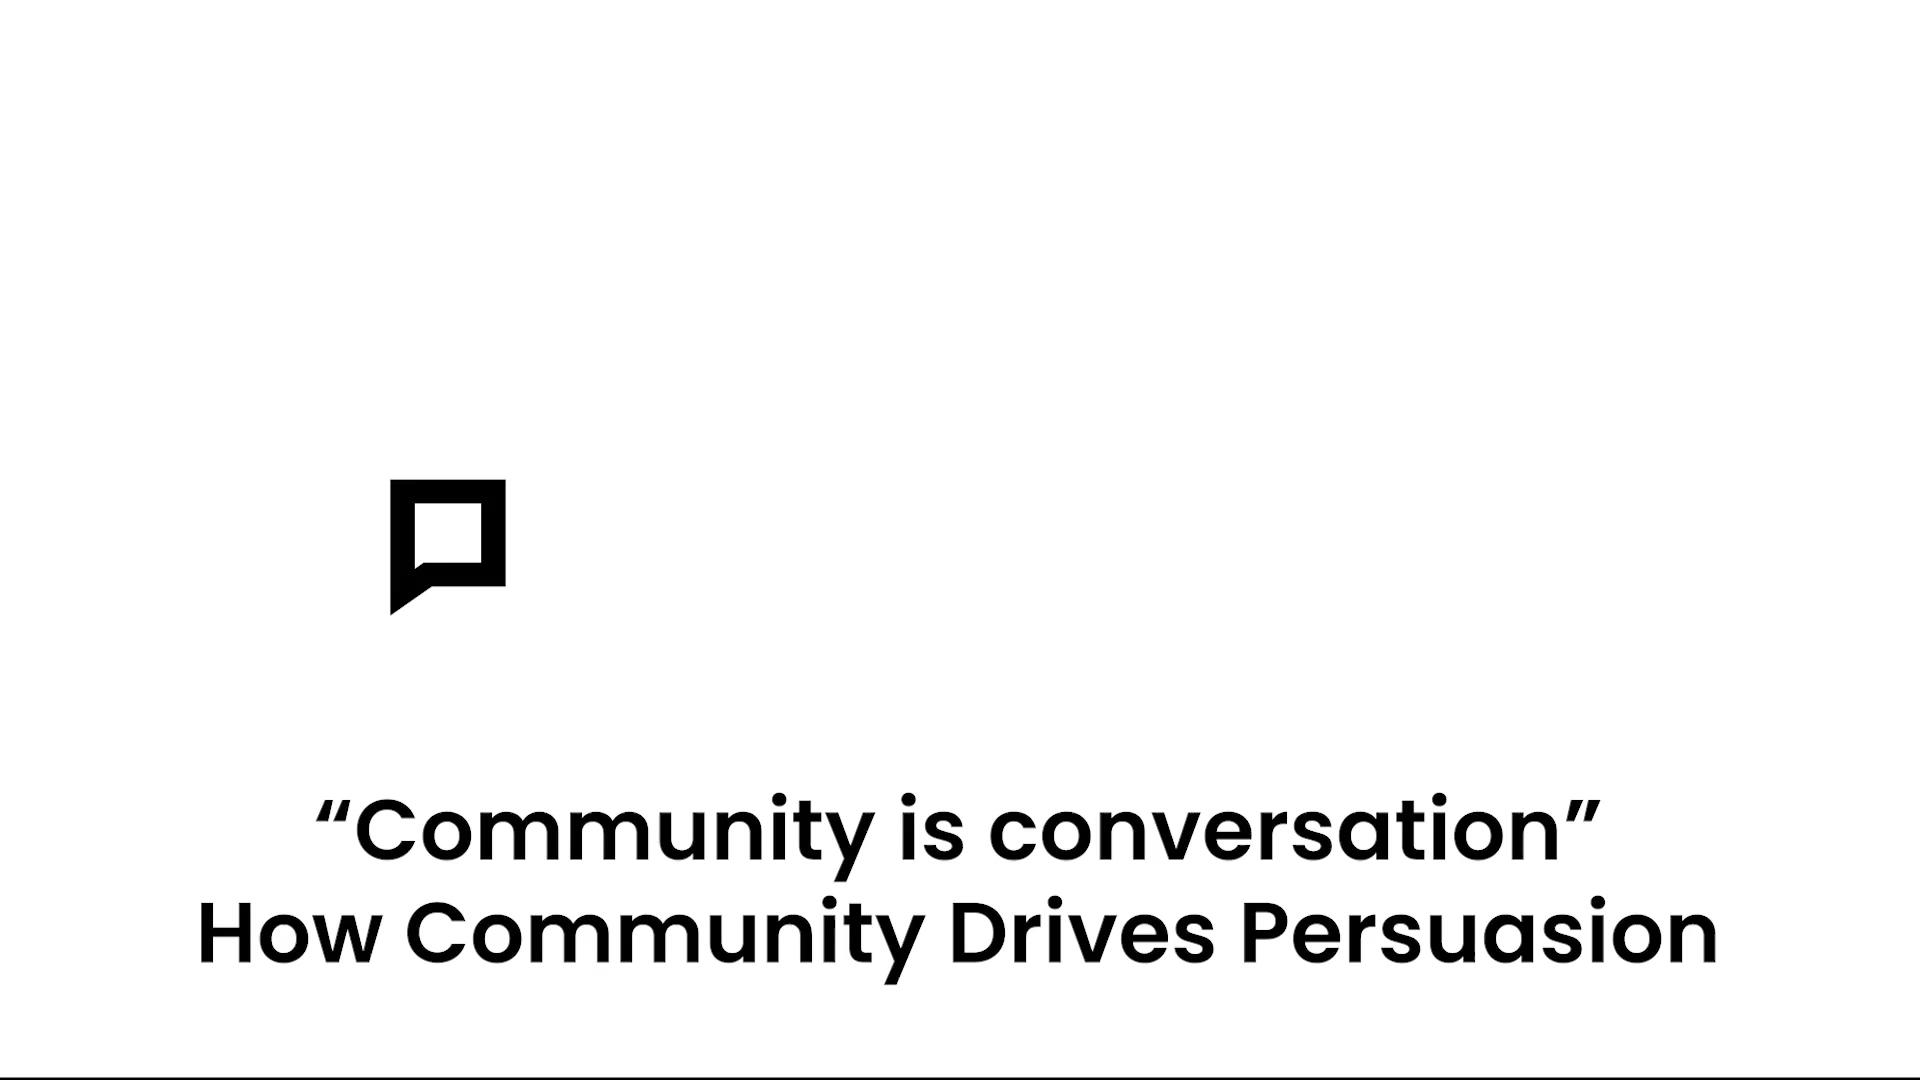 Community is Conversation